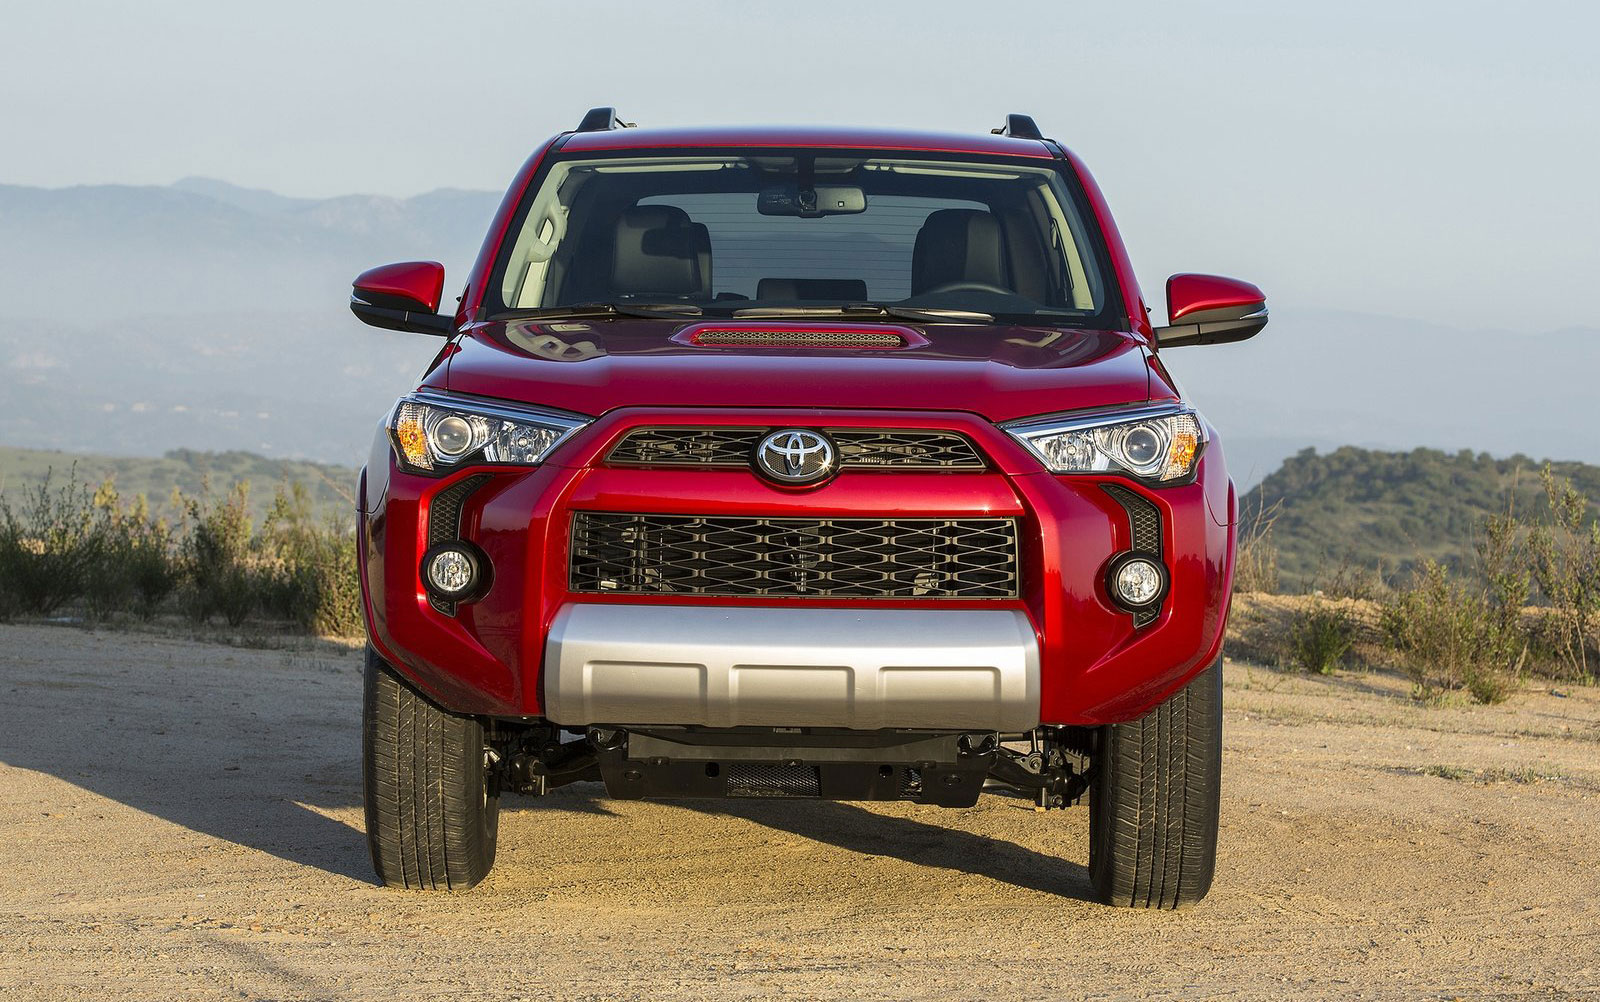 Back to Story: 2014 Toyota 4Runner – truck-based SUV gets facelift